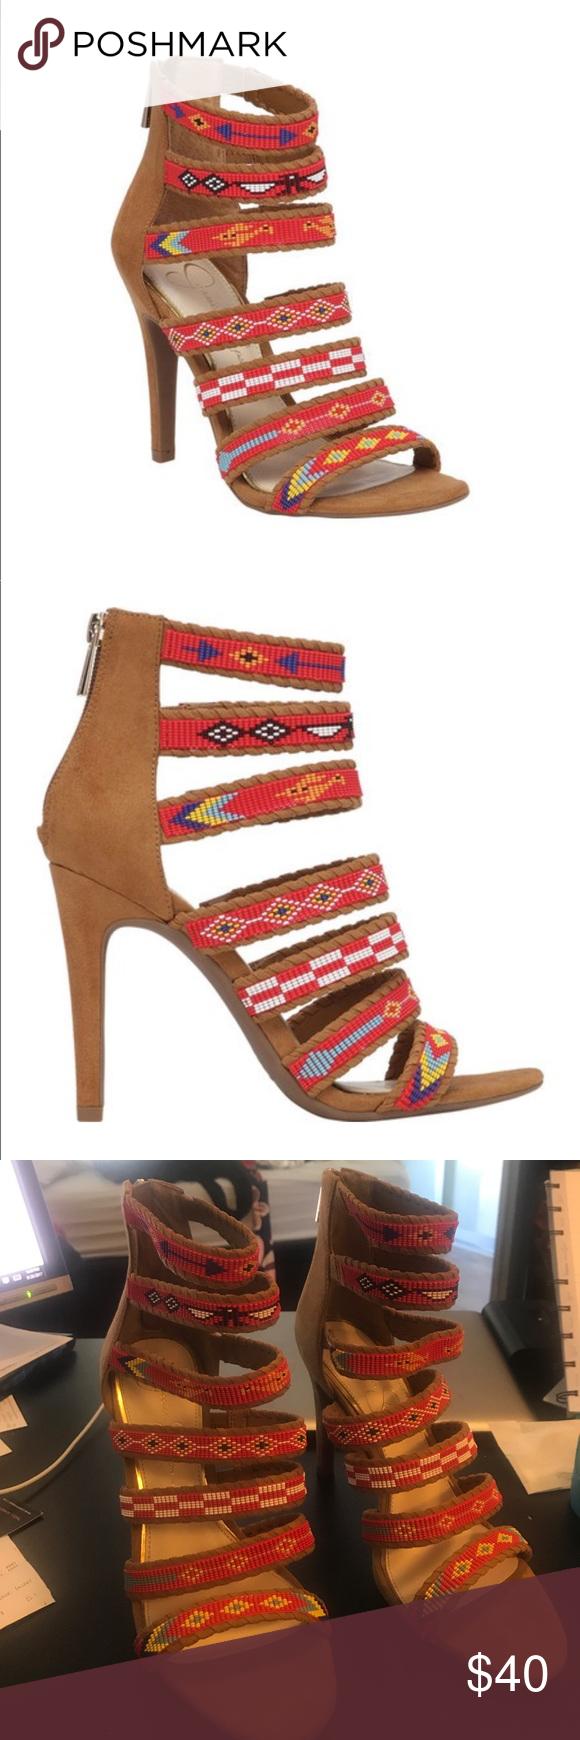 Jessica Simpson Etienne Sandals Nwot Jessica Simpson Shoes Heels Strappy Sandals Rubber Bead